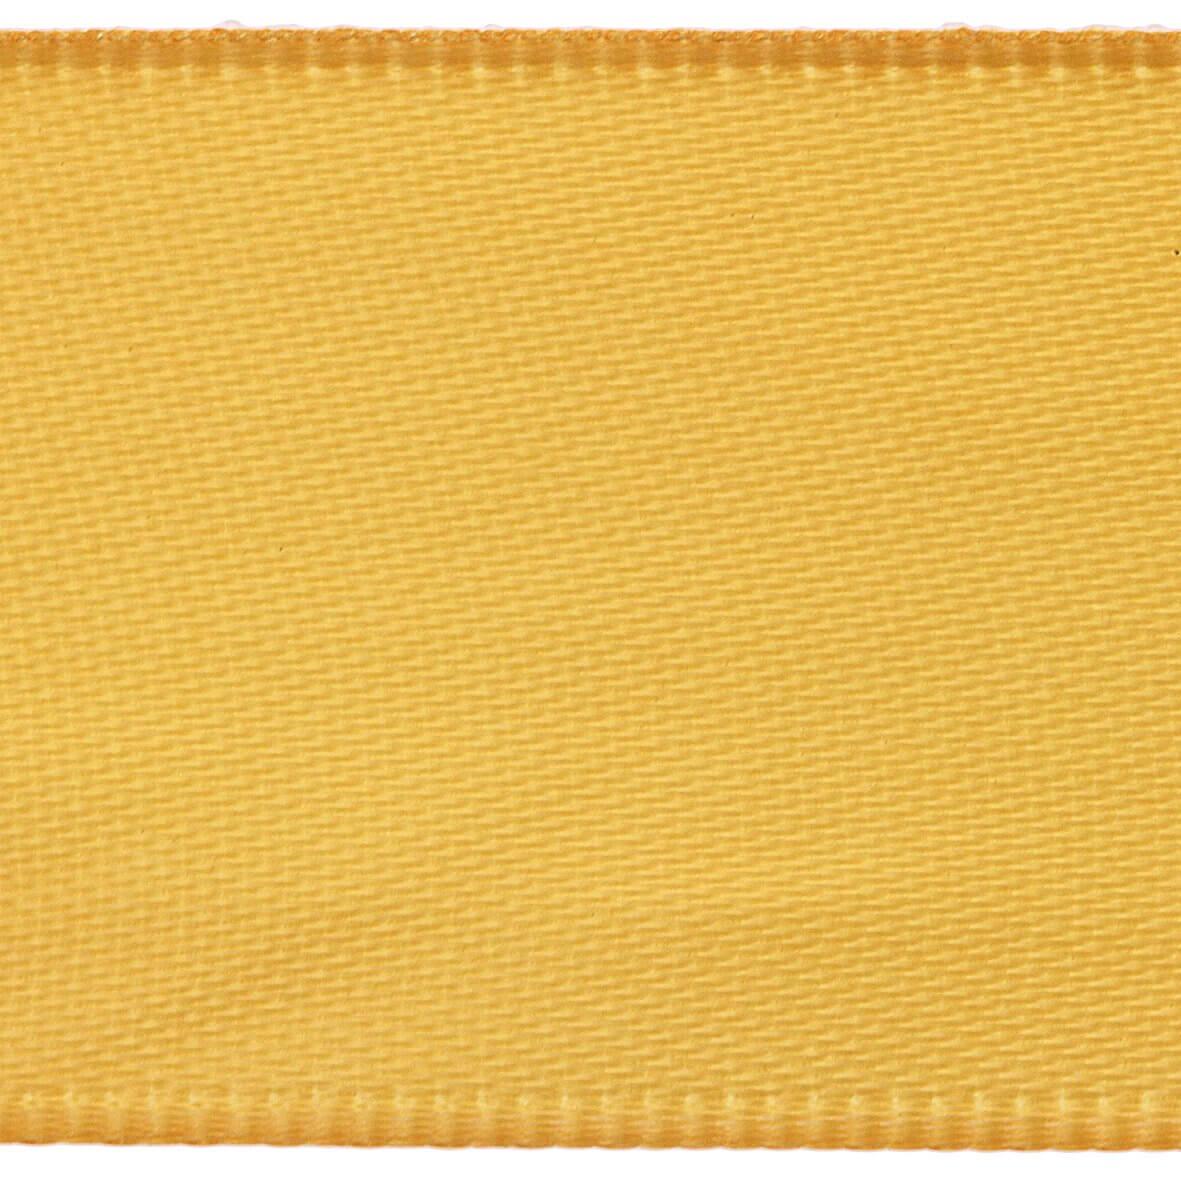 Marigold Club Green 15mm Double Faced Satin Ribbon